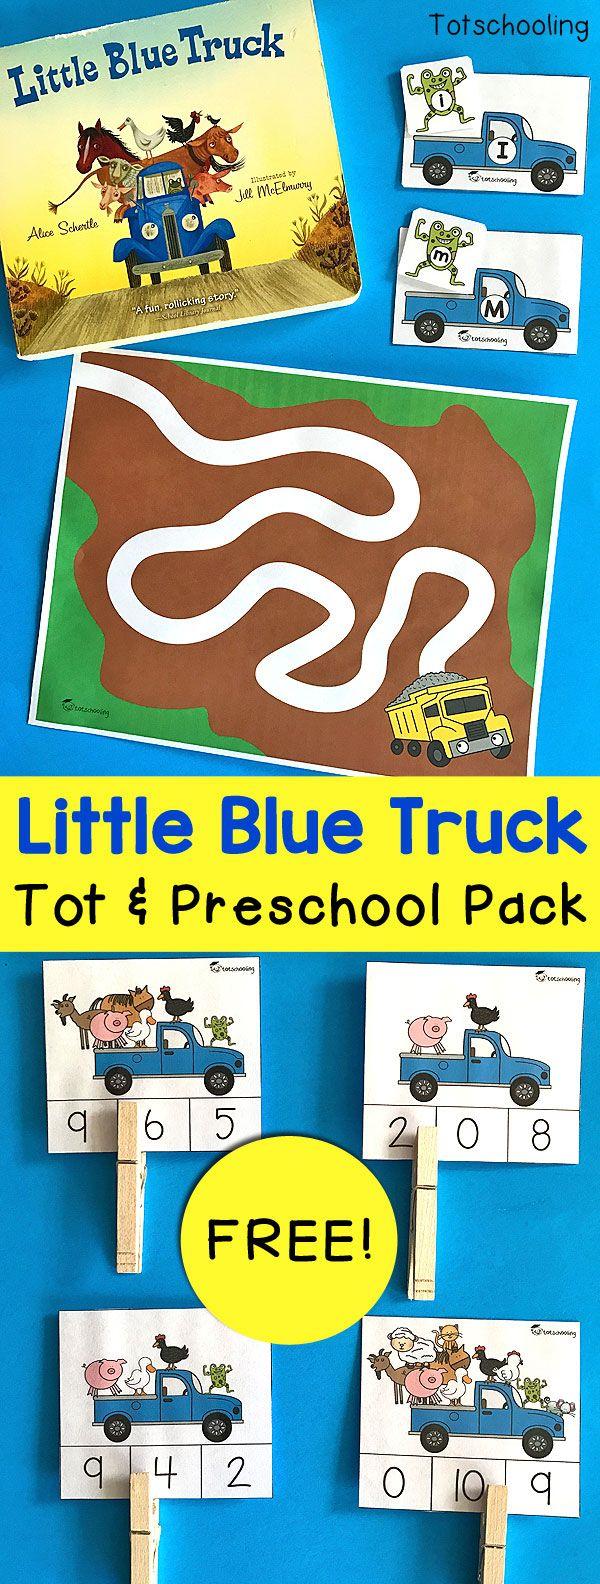 Little Blue Truck Activities for